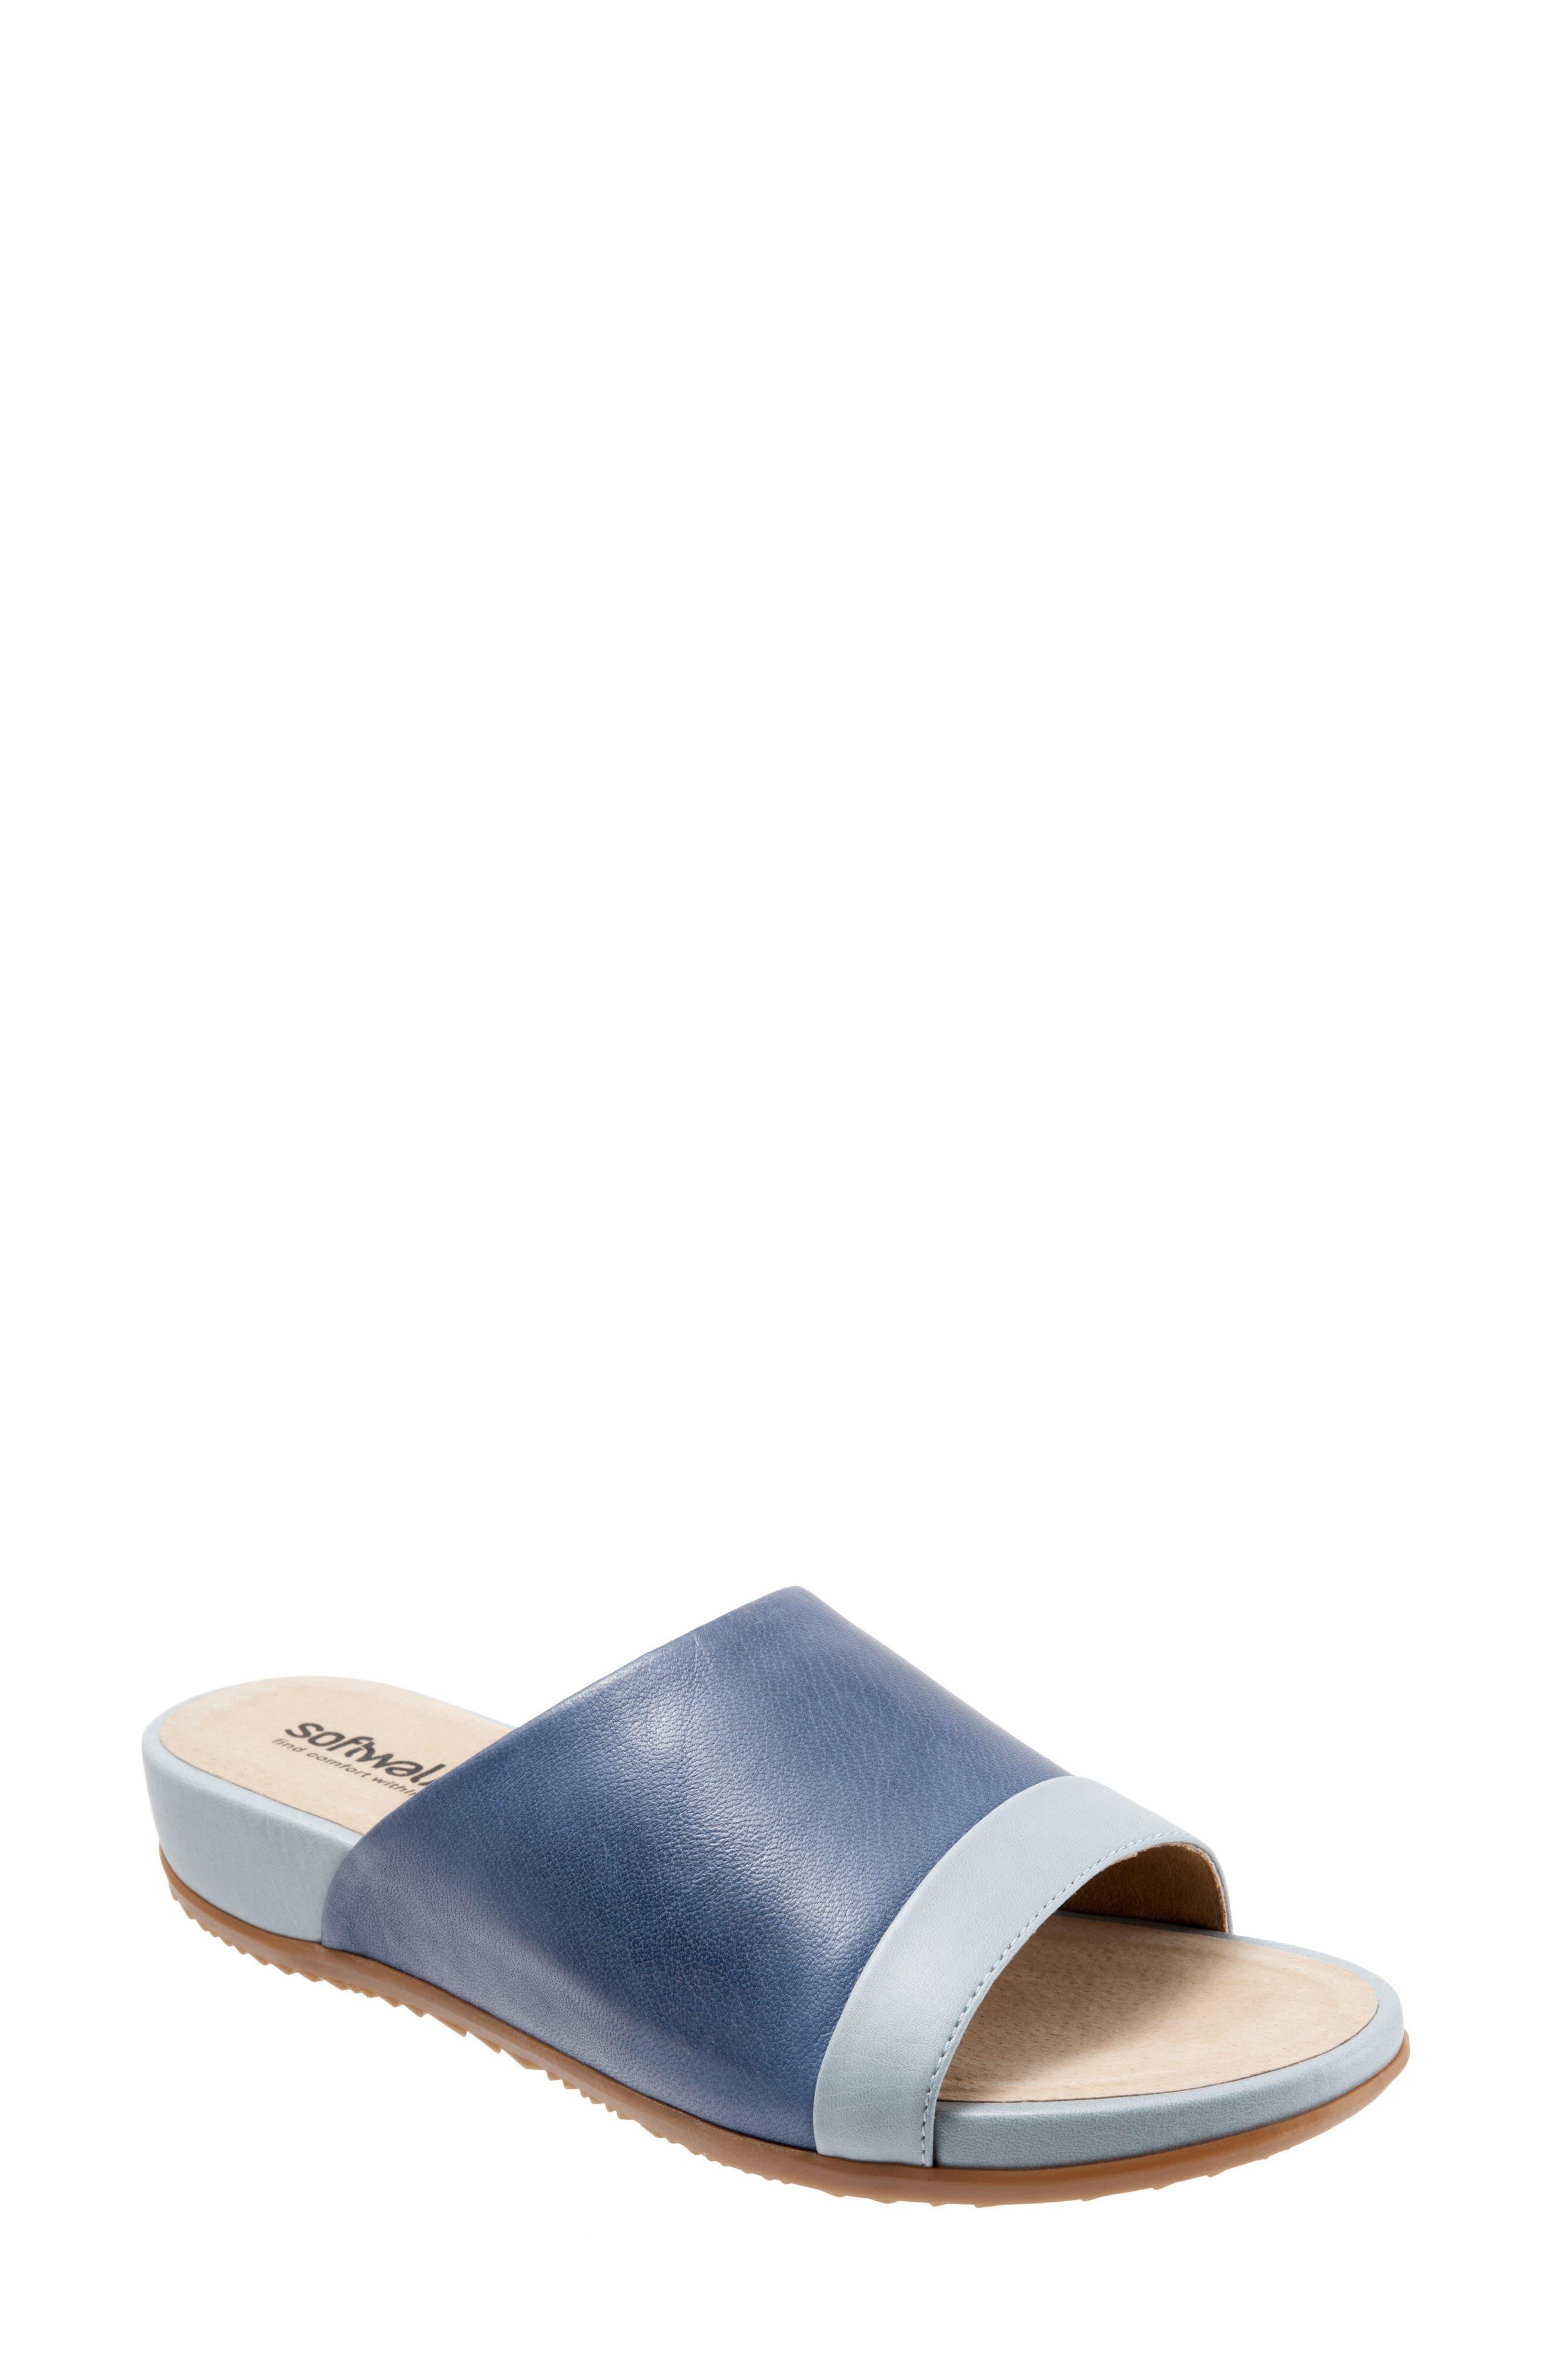 Main Image - SoftWalk® Del Mar Slide Sandal (Women)